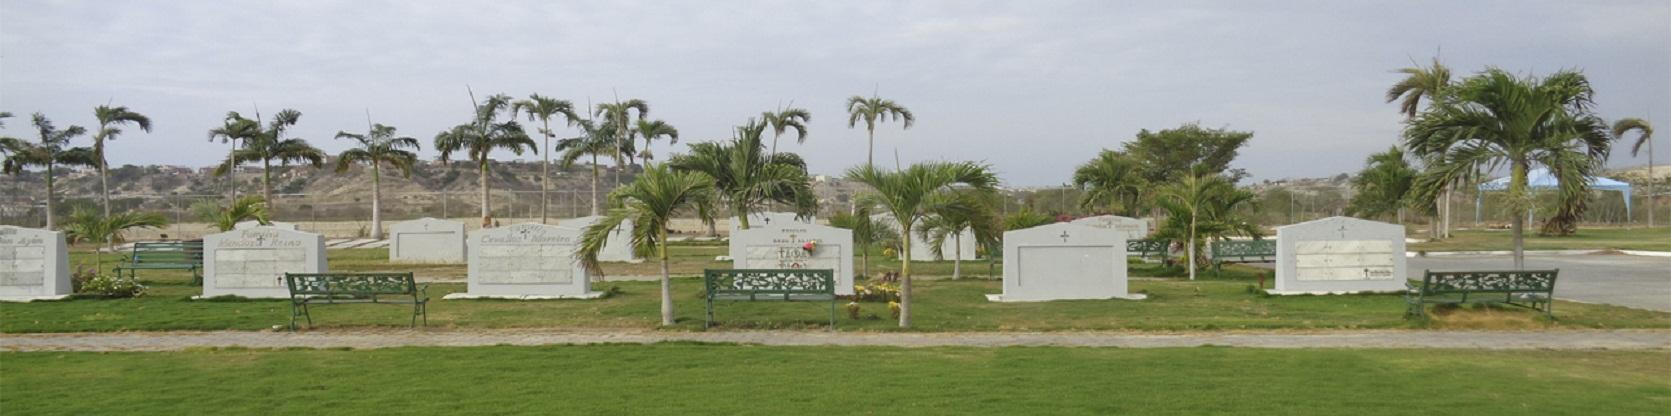 Cementerio jardines del ed n iquitos travel guide for Cementerio jardin